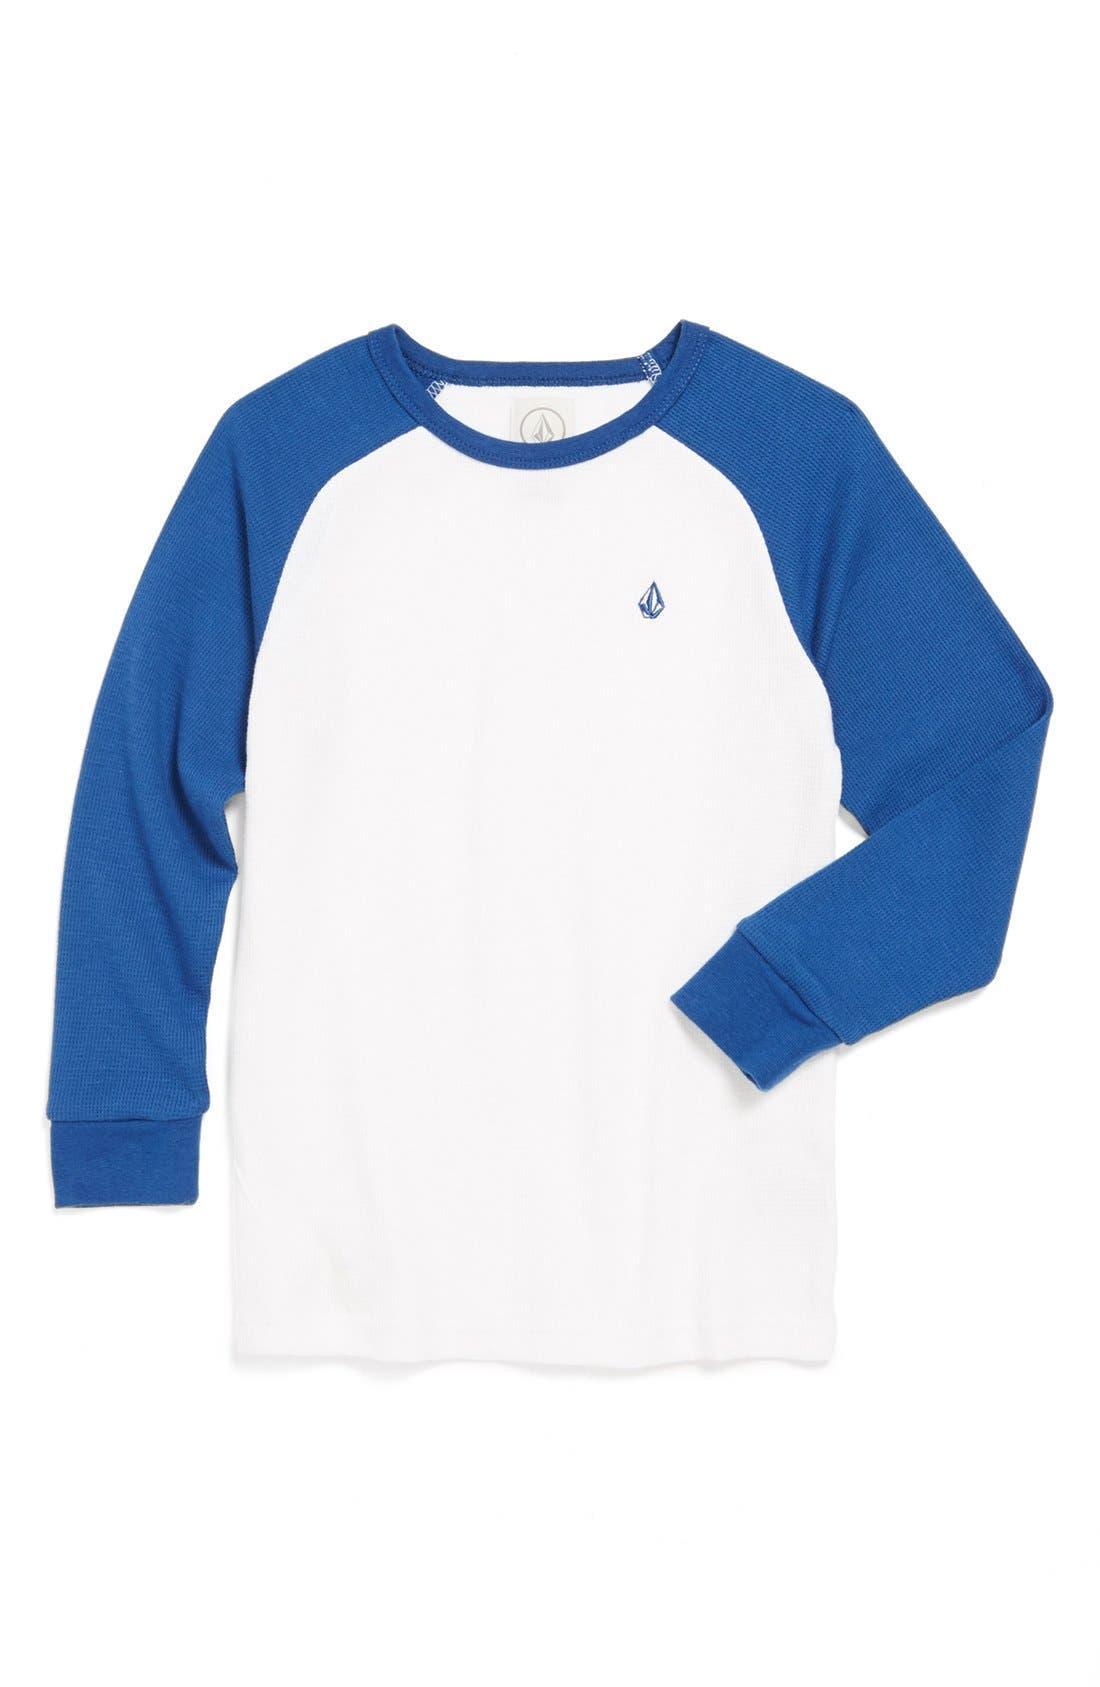 Main Image - Volcom 'Fabuloso' Raglan Long Sleeve Raglan Thermal T-Shirt (Little Boys)